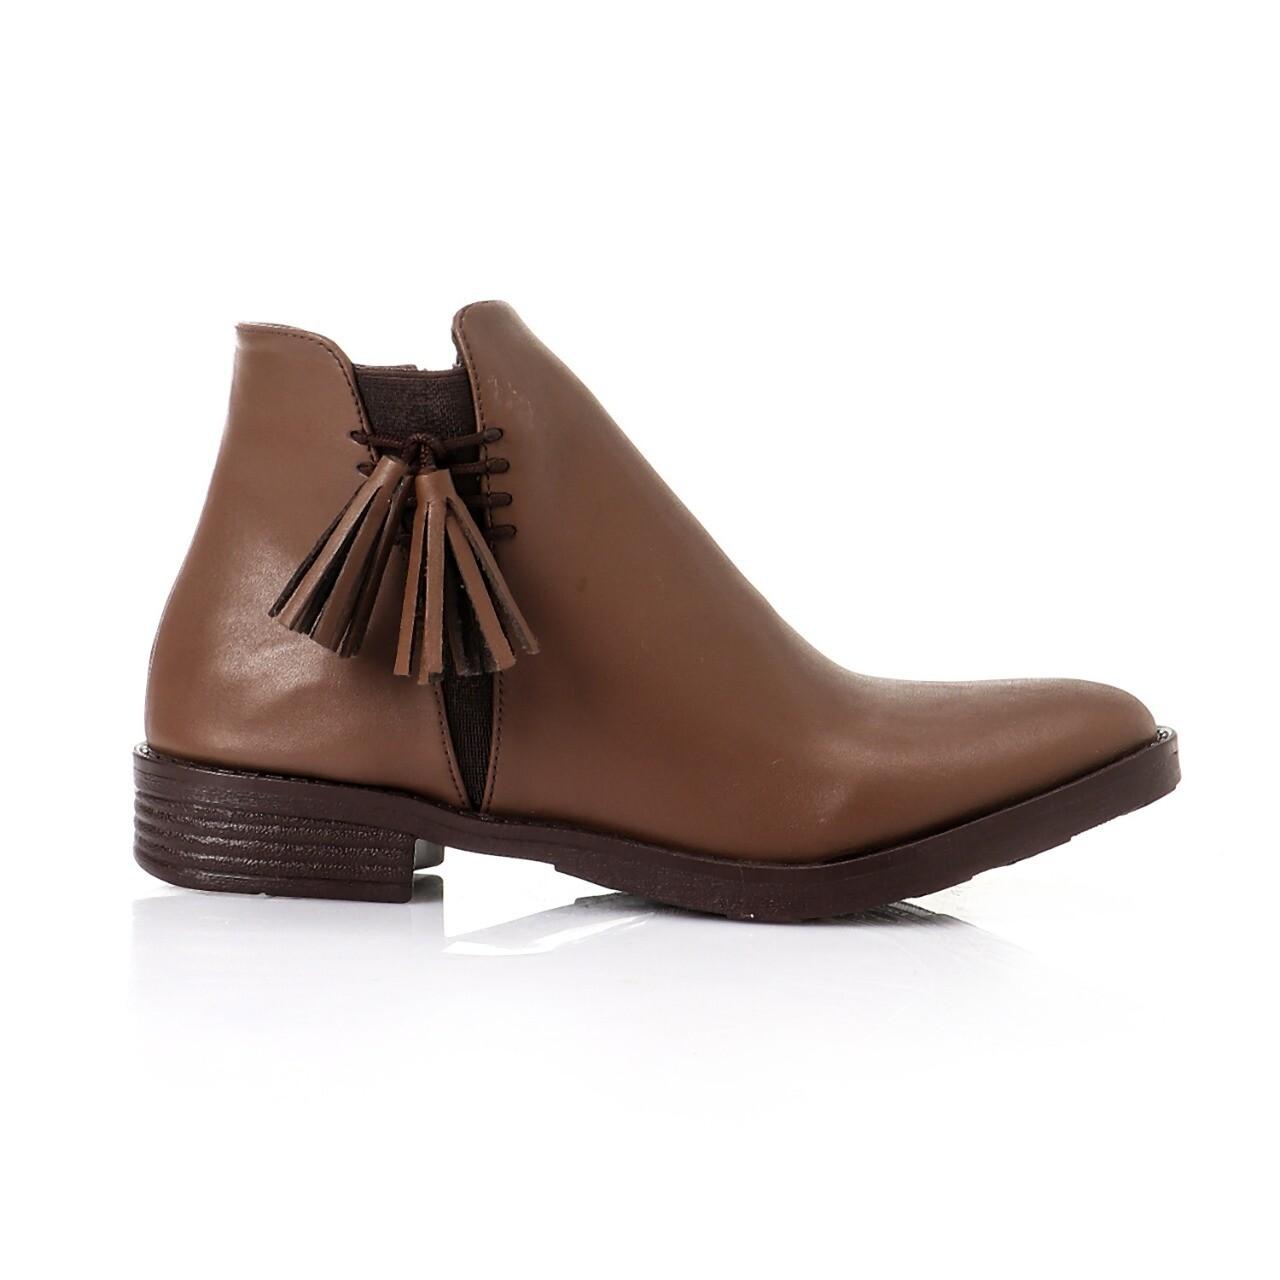 3750-half boot-BROWN